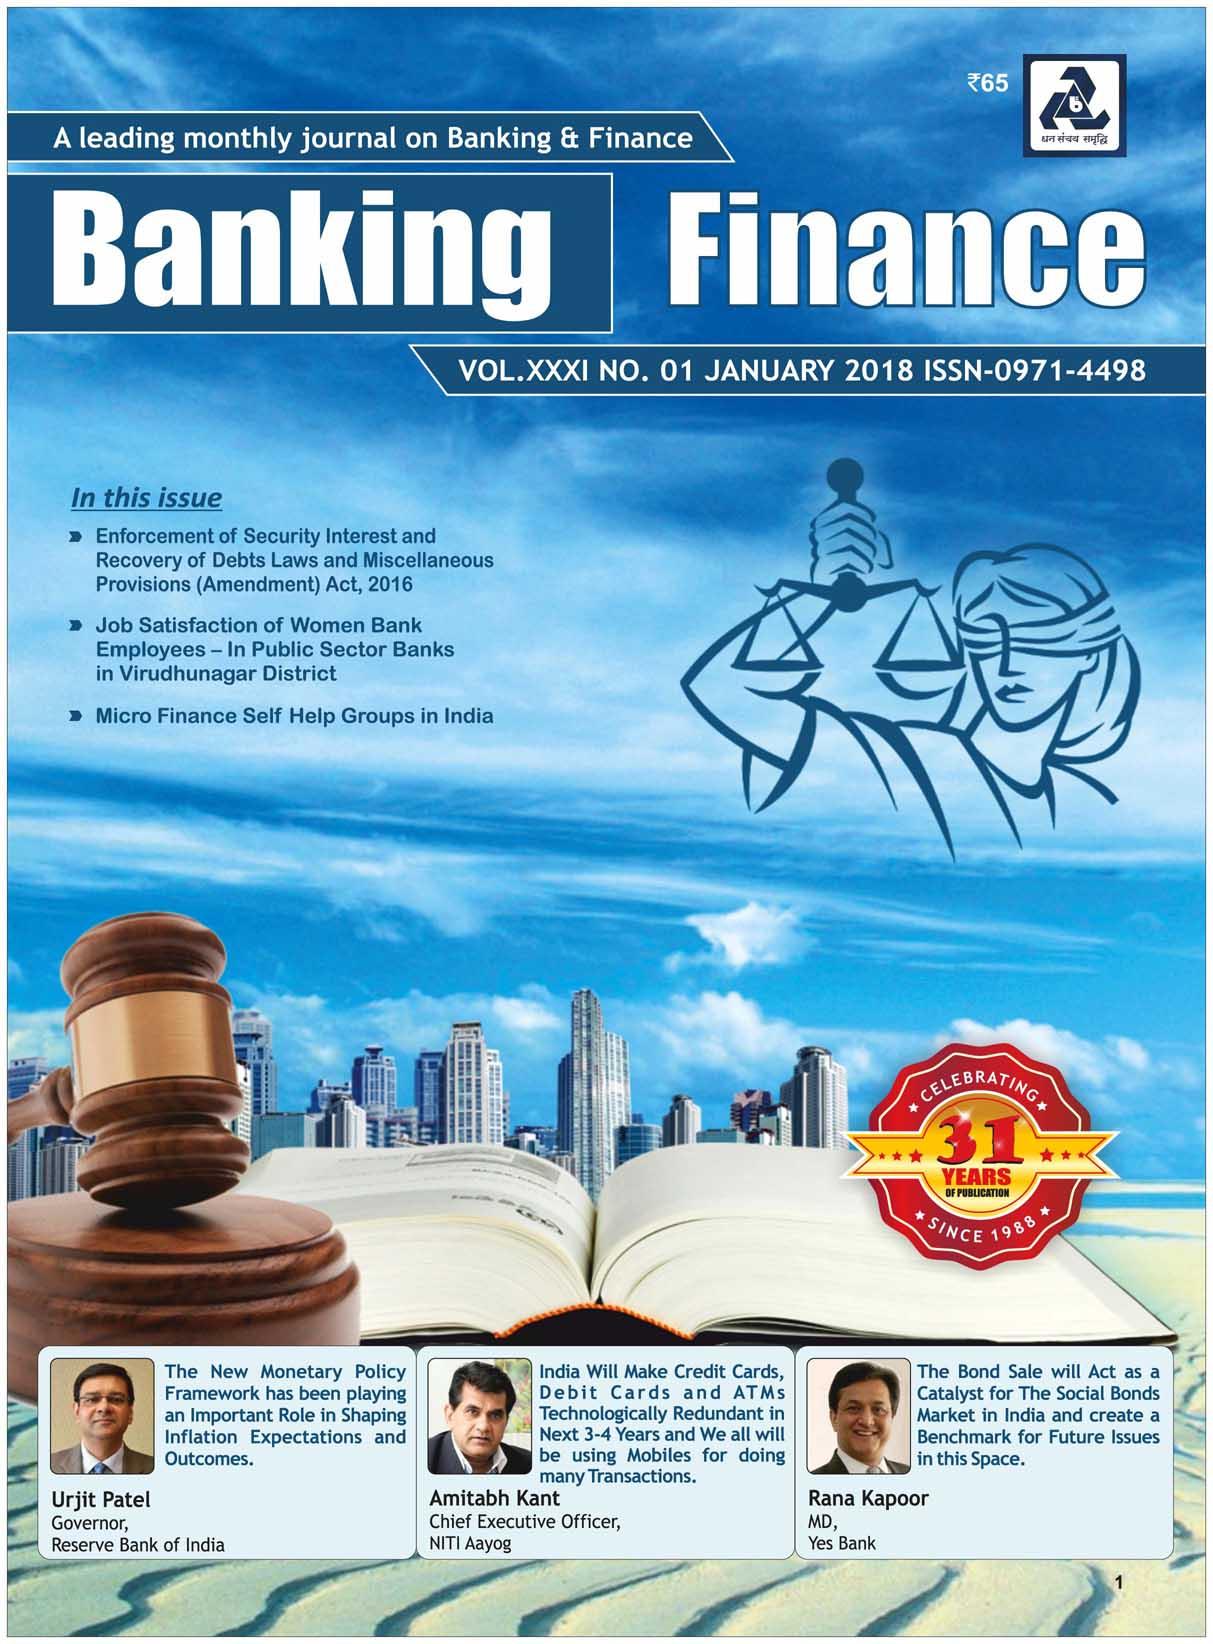 Banking Finance January 2018